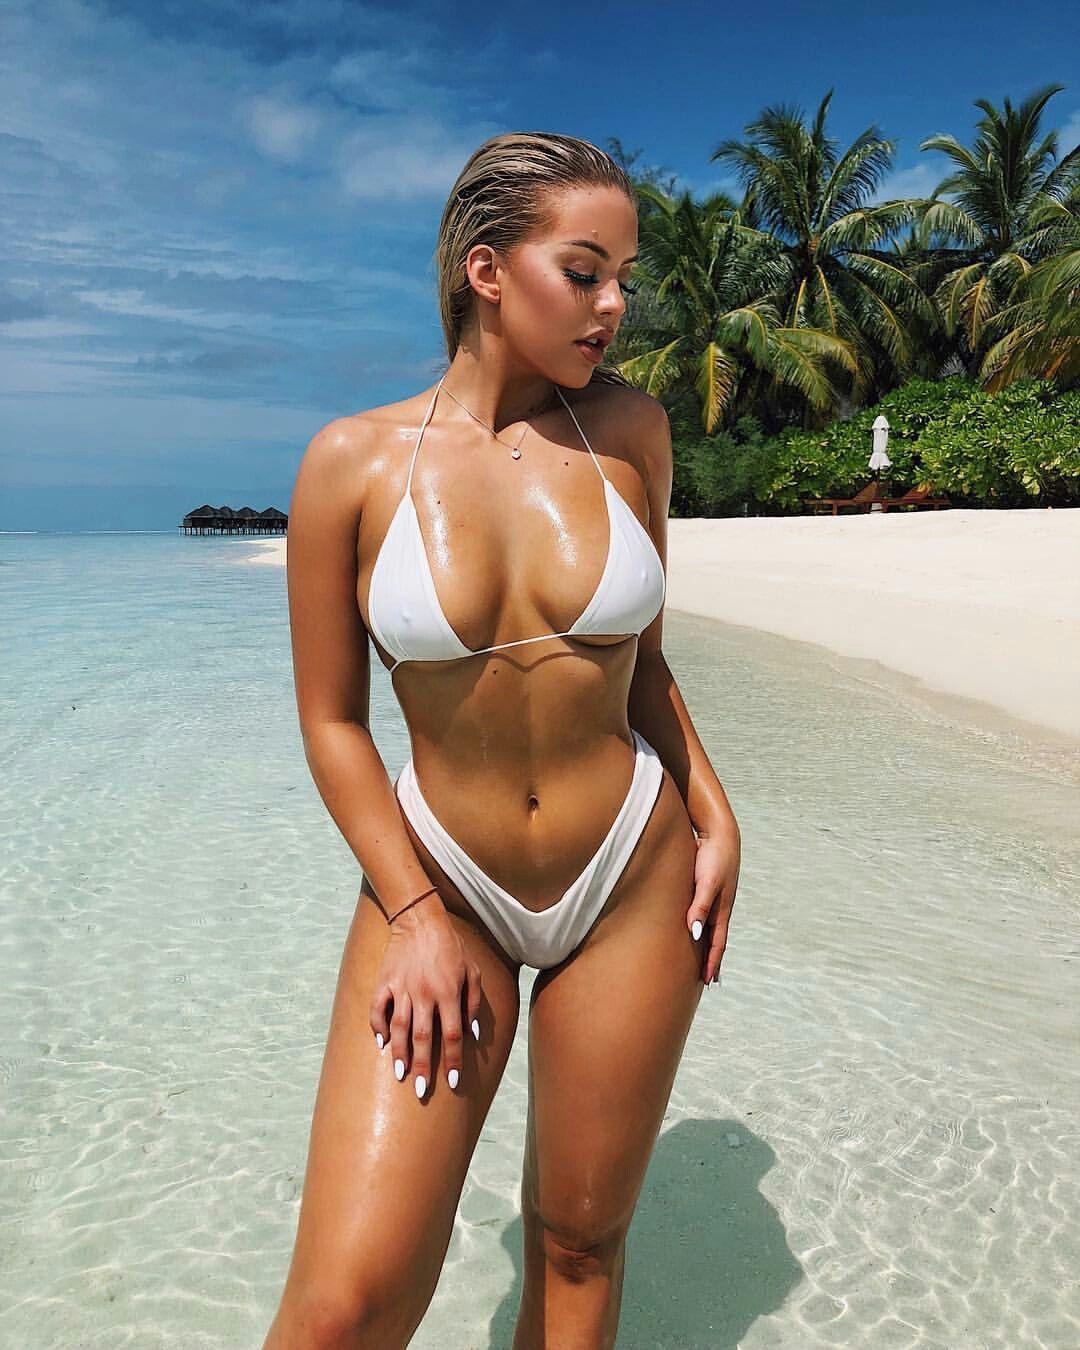 Pin By Lady J On Gracie Piscopo Bikinis Bikini Pictures Young